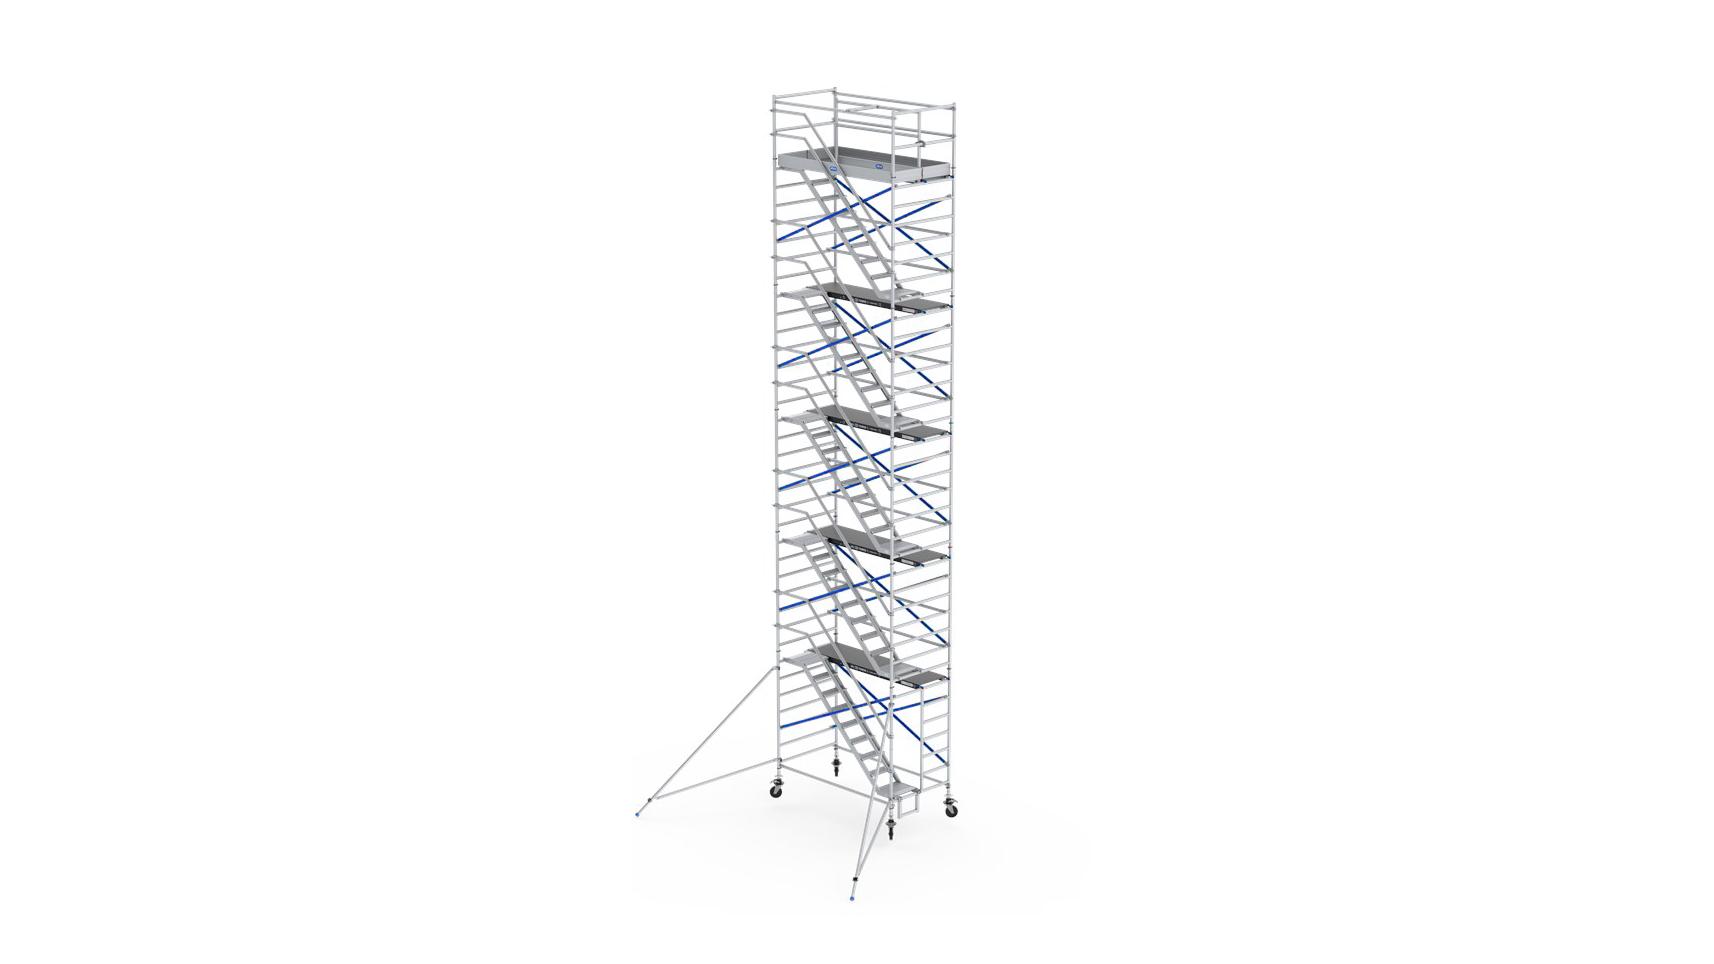 62000206-trapsteiger-vloer-1220